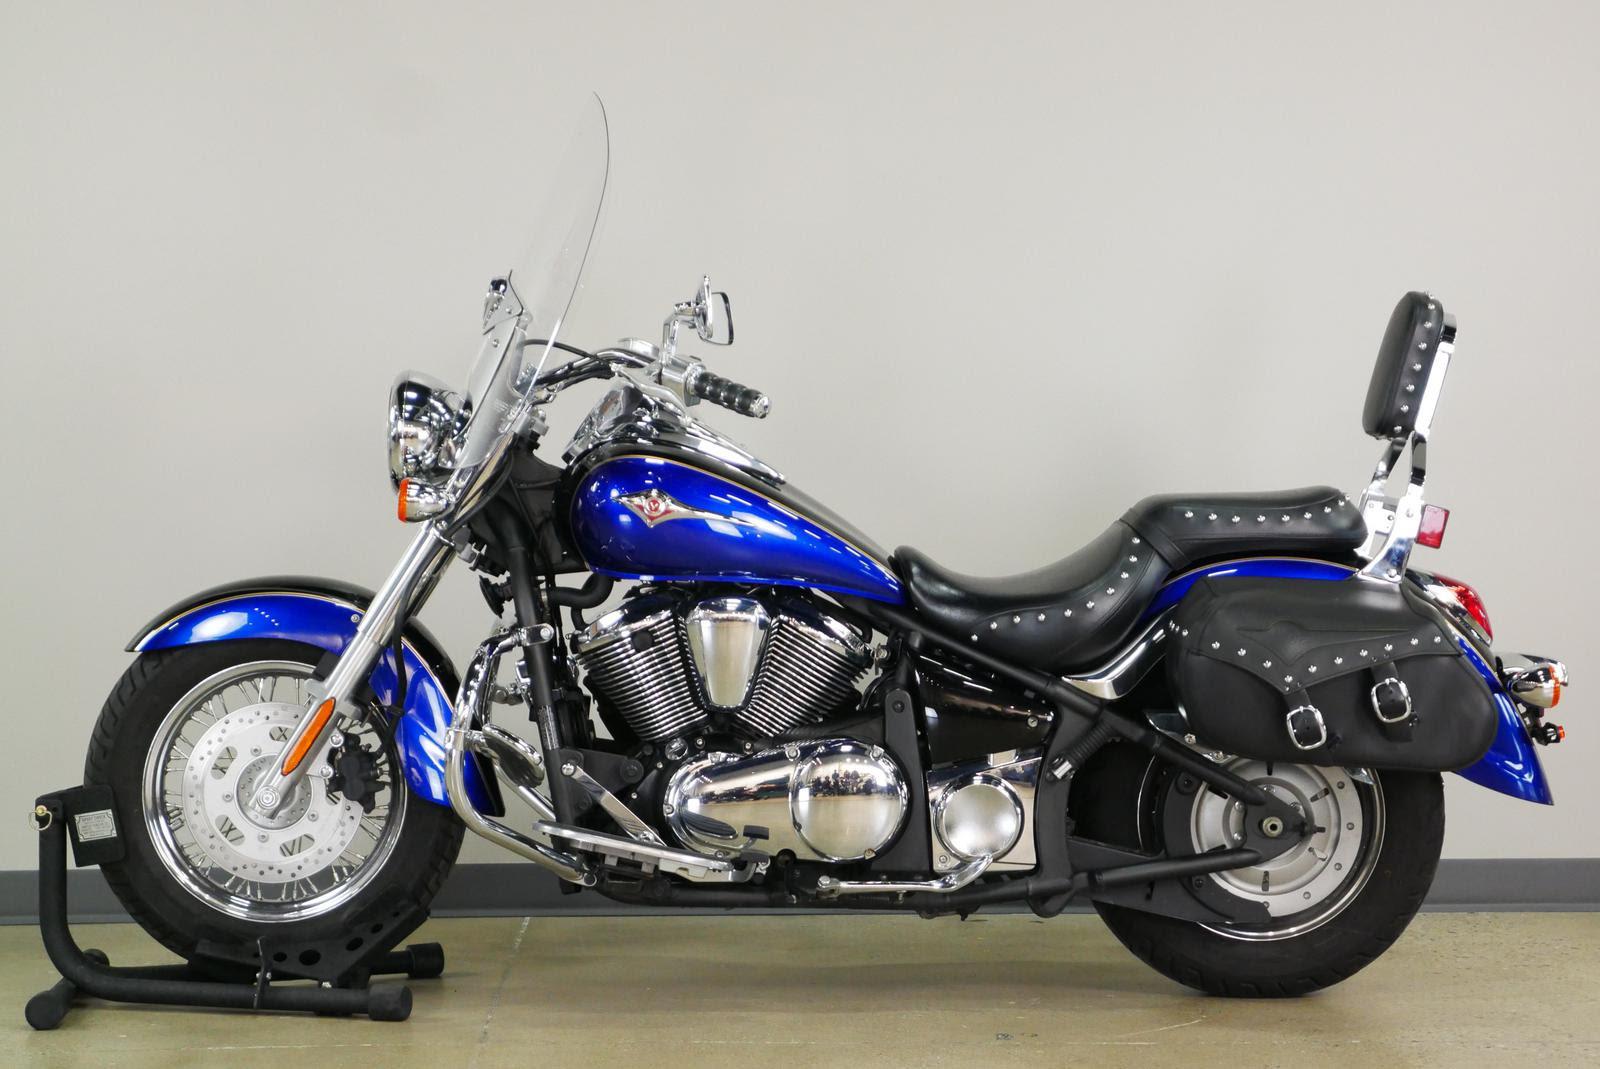 2009 Kawasaki Vulcan 900 Classic Lt For Sale In Indianapolis